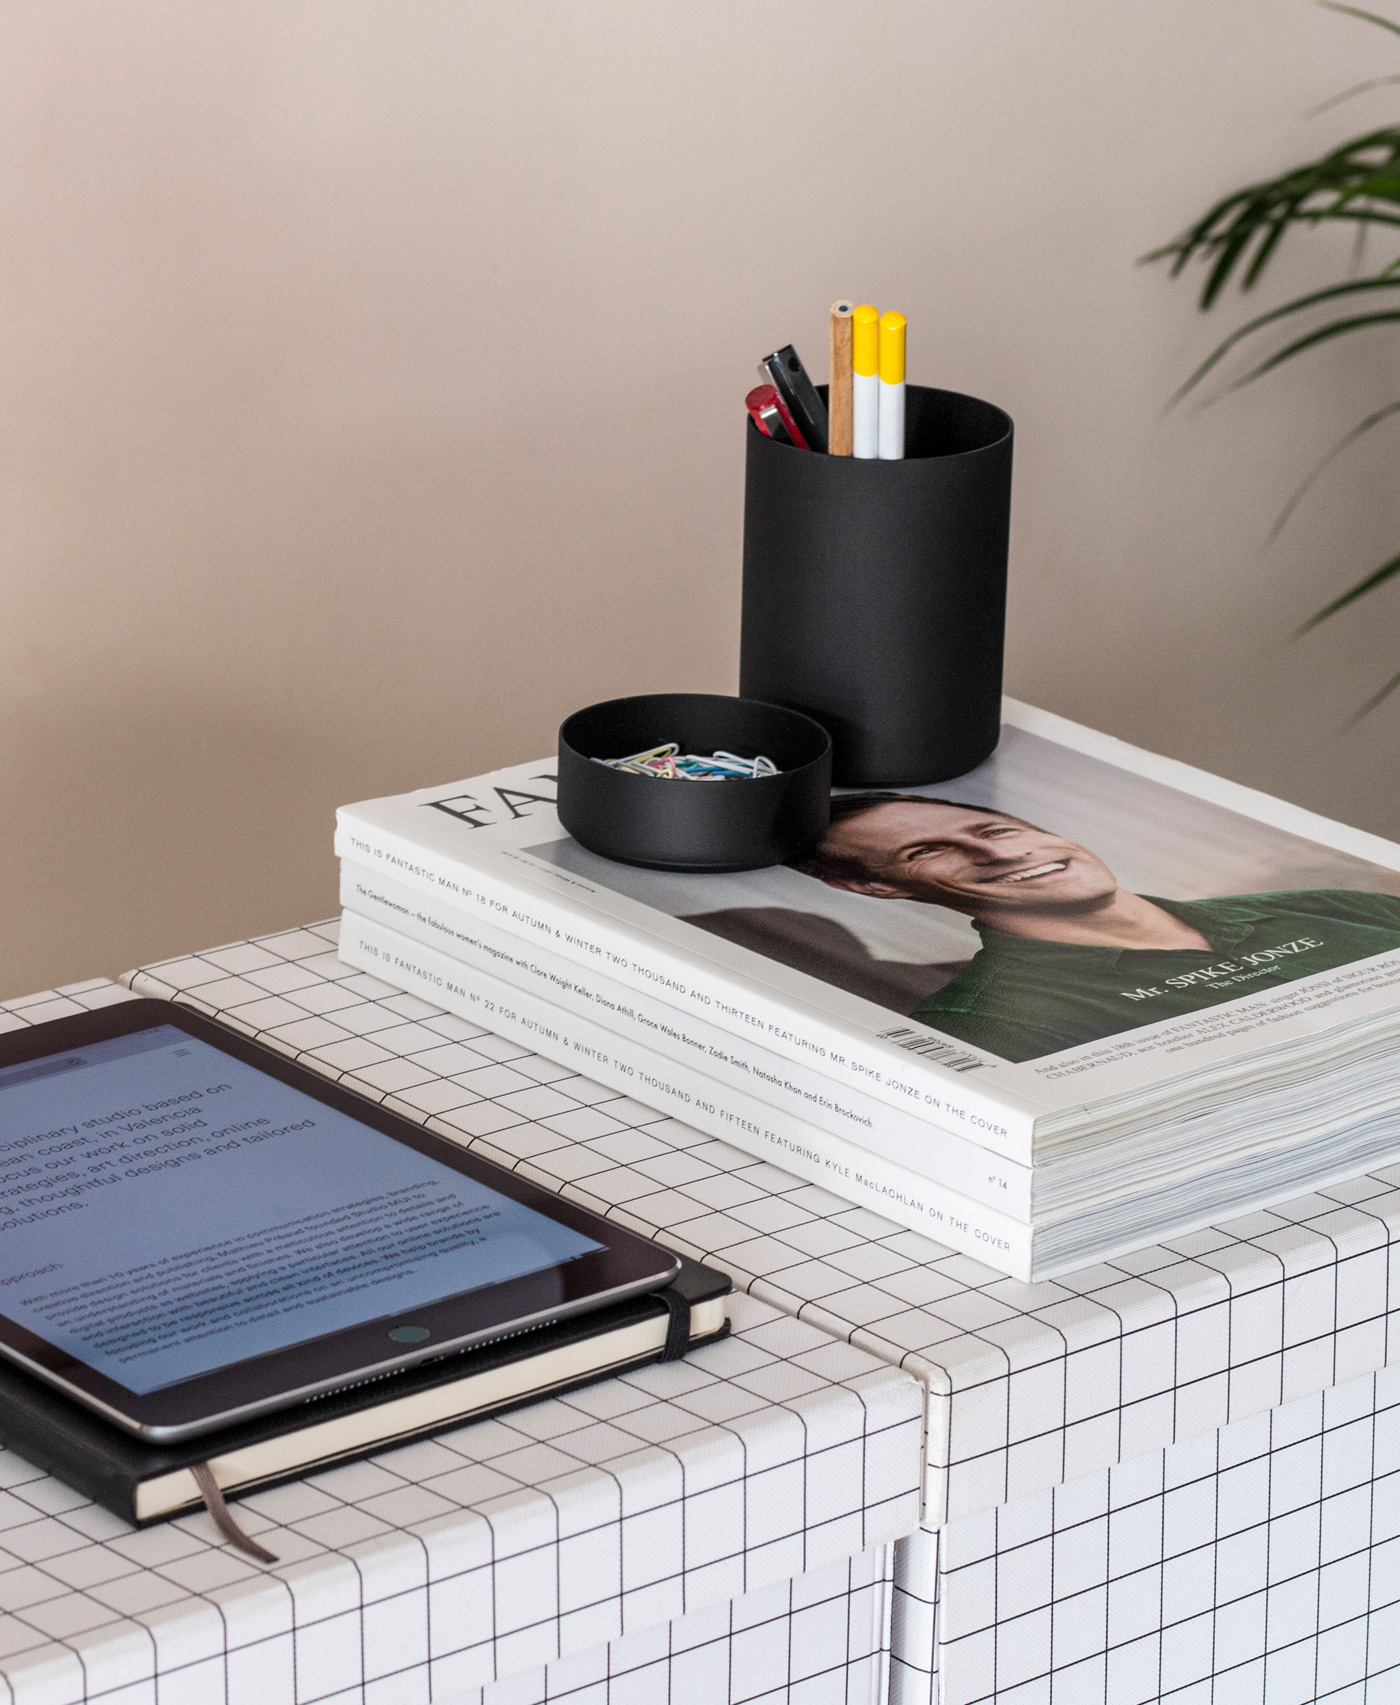 Studio MUI - Branding Strategy, Design & Digital Solutions in Valencia